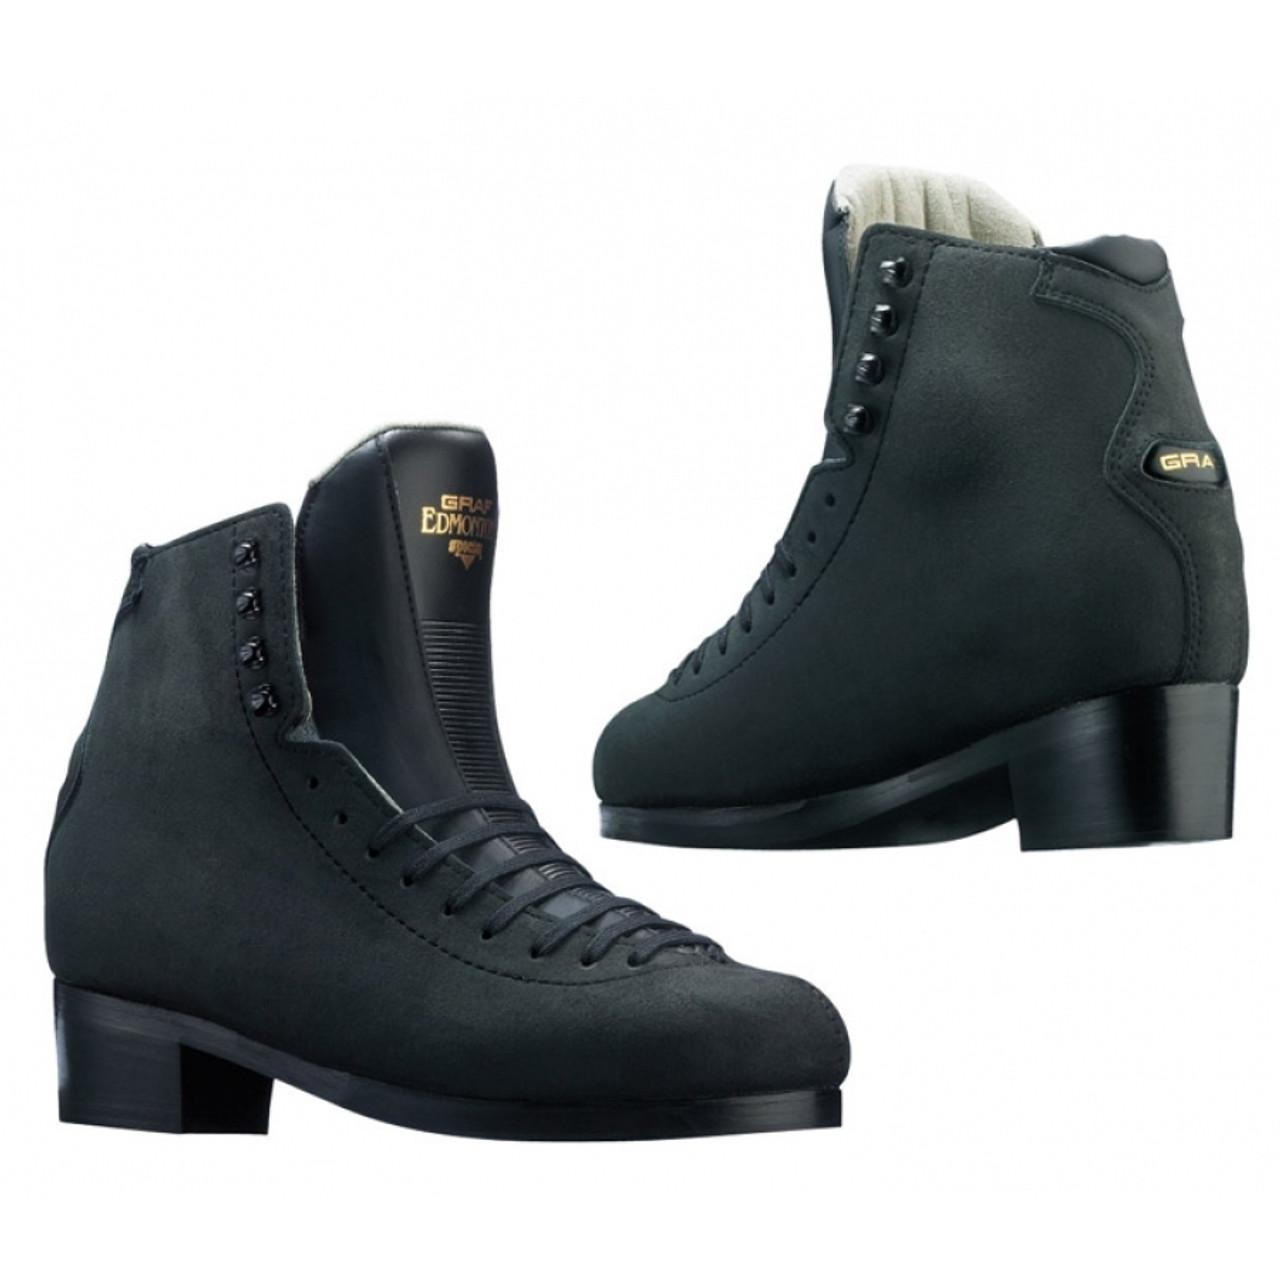 Graf Edmonton Special Boot Men's